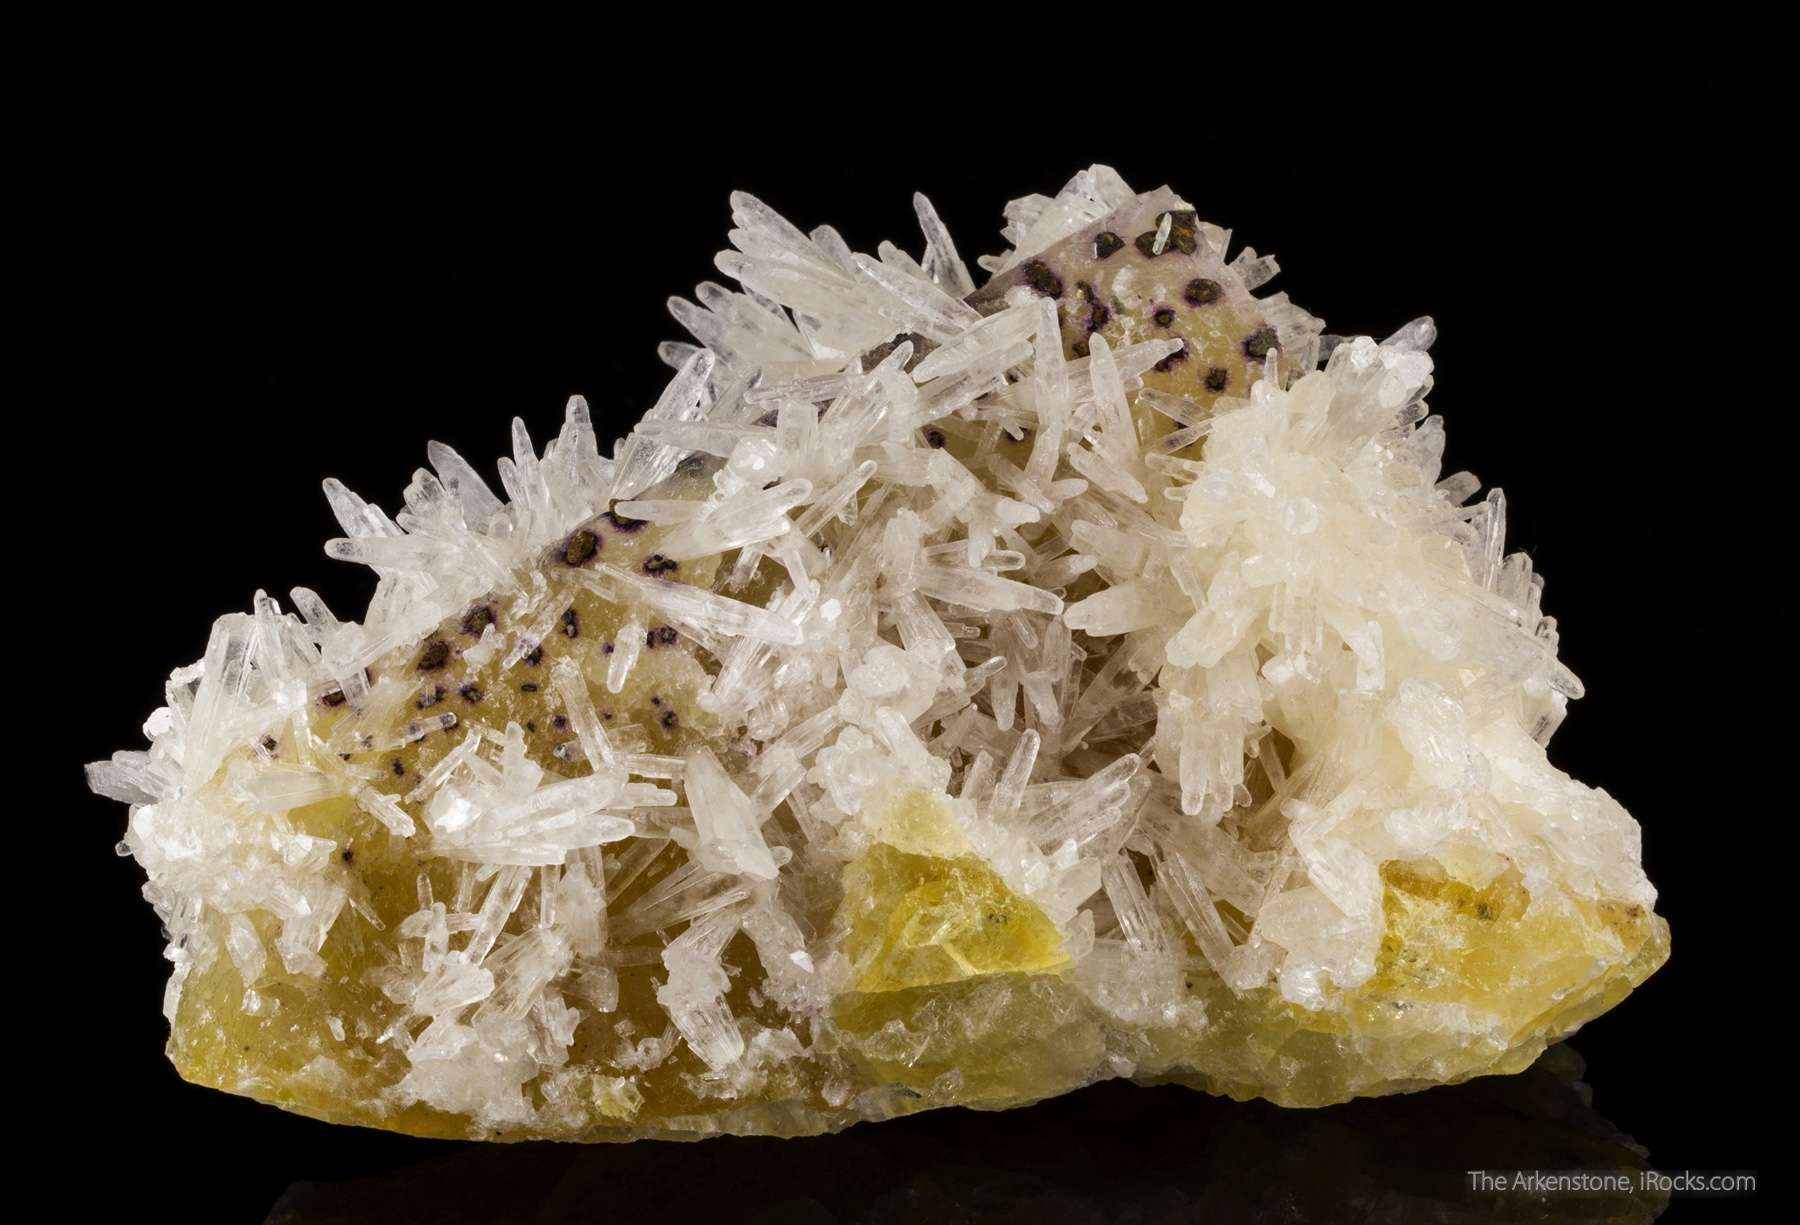 Acicular scalenohedrons lustrous translucent colorless calcite 1 5 cm